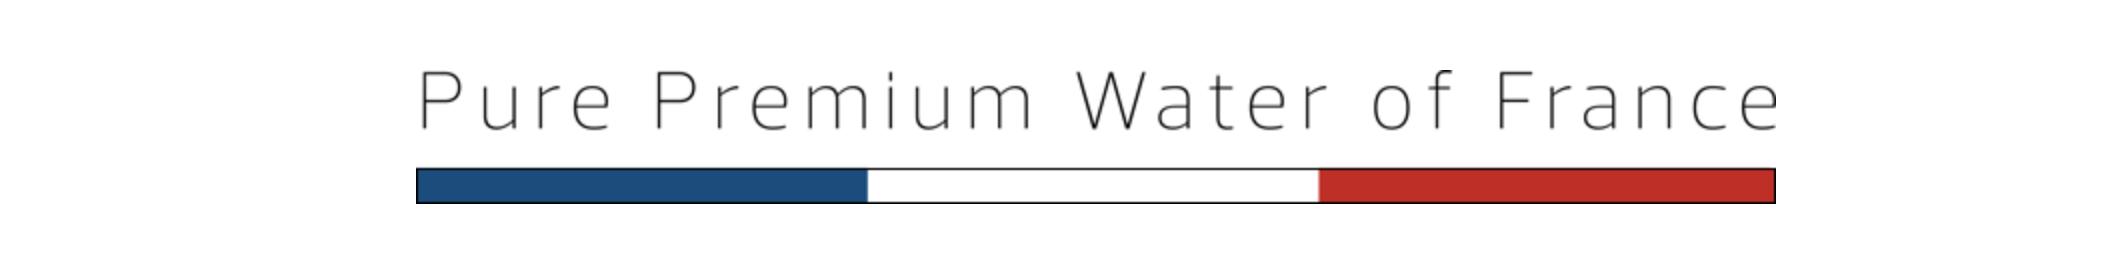 pure-premium-water